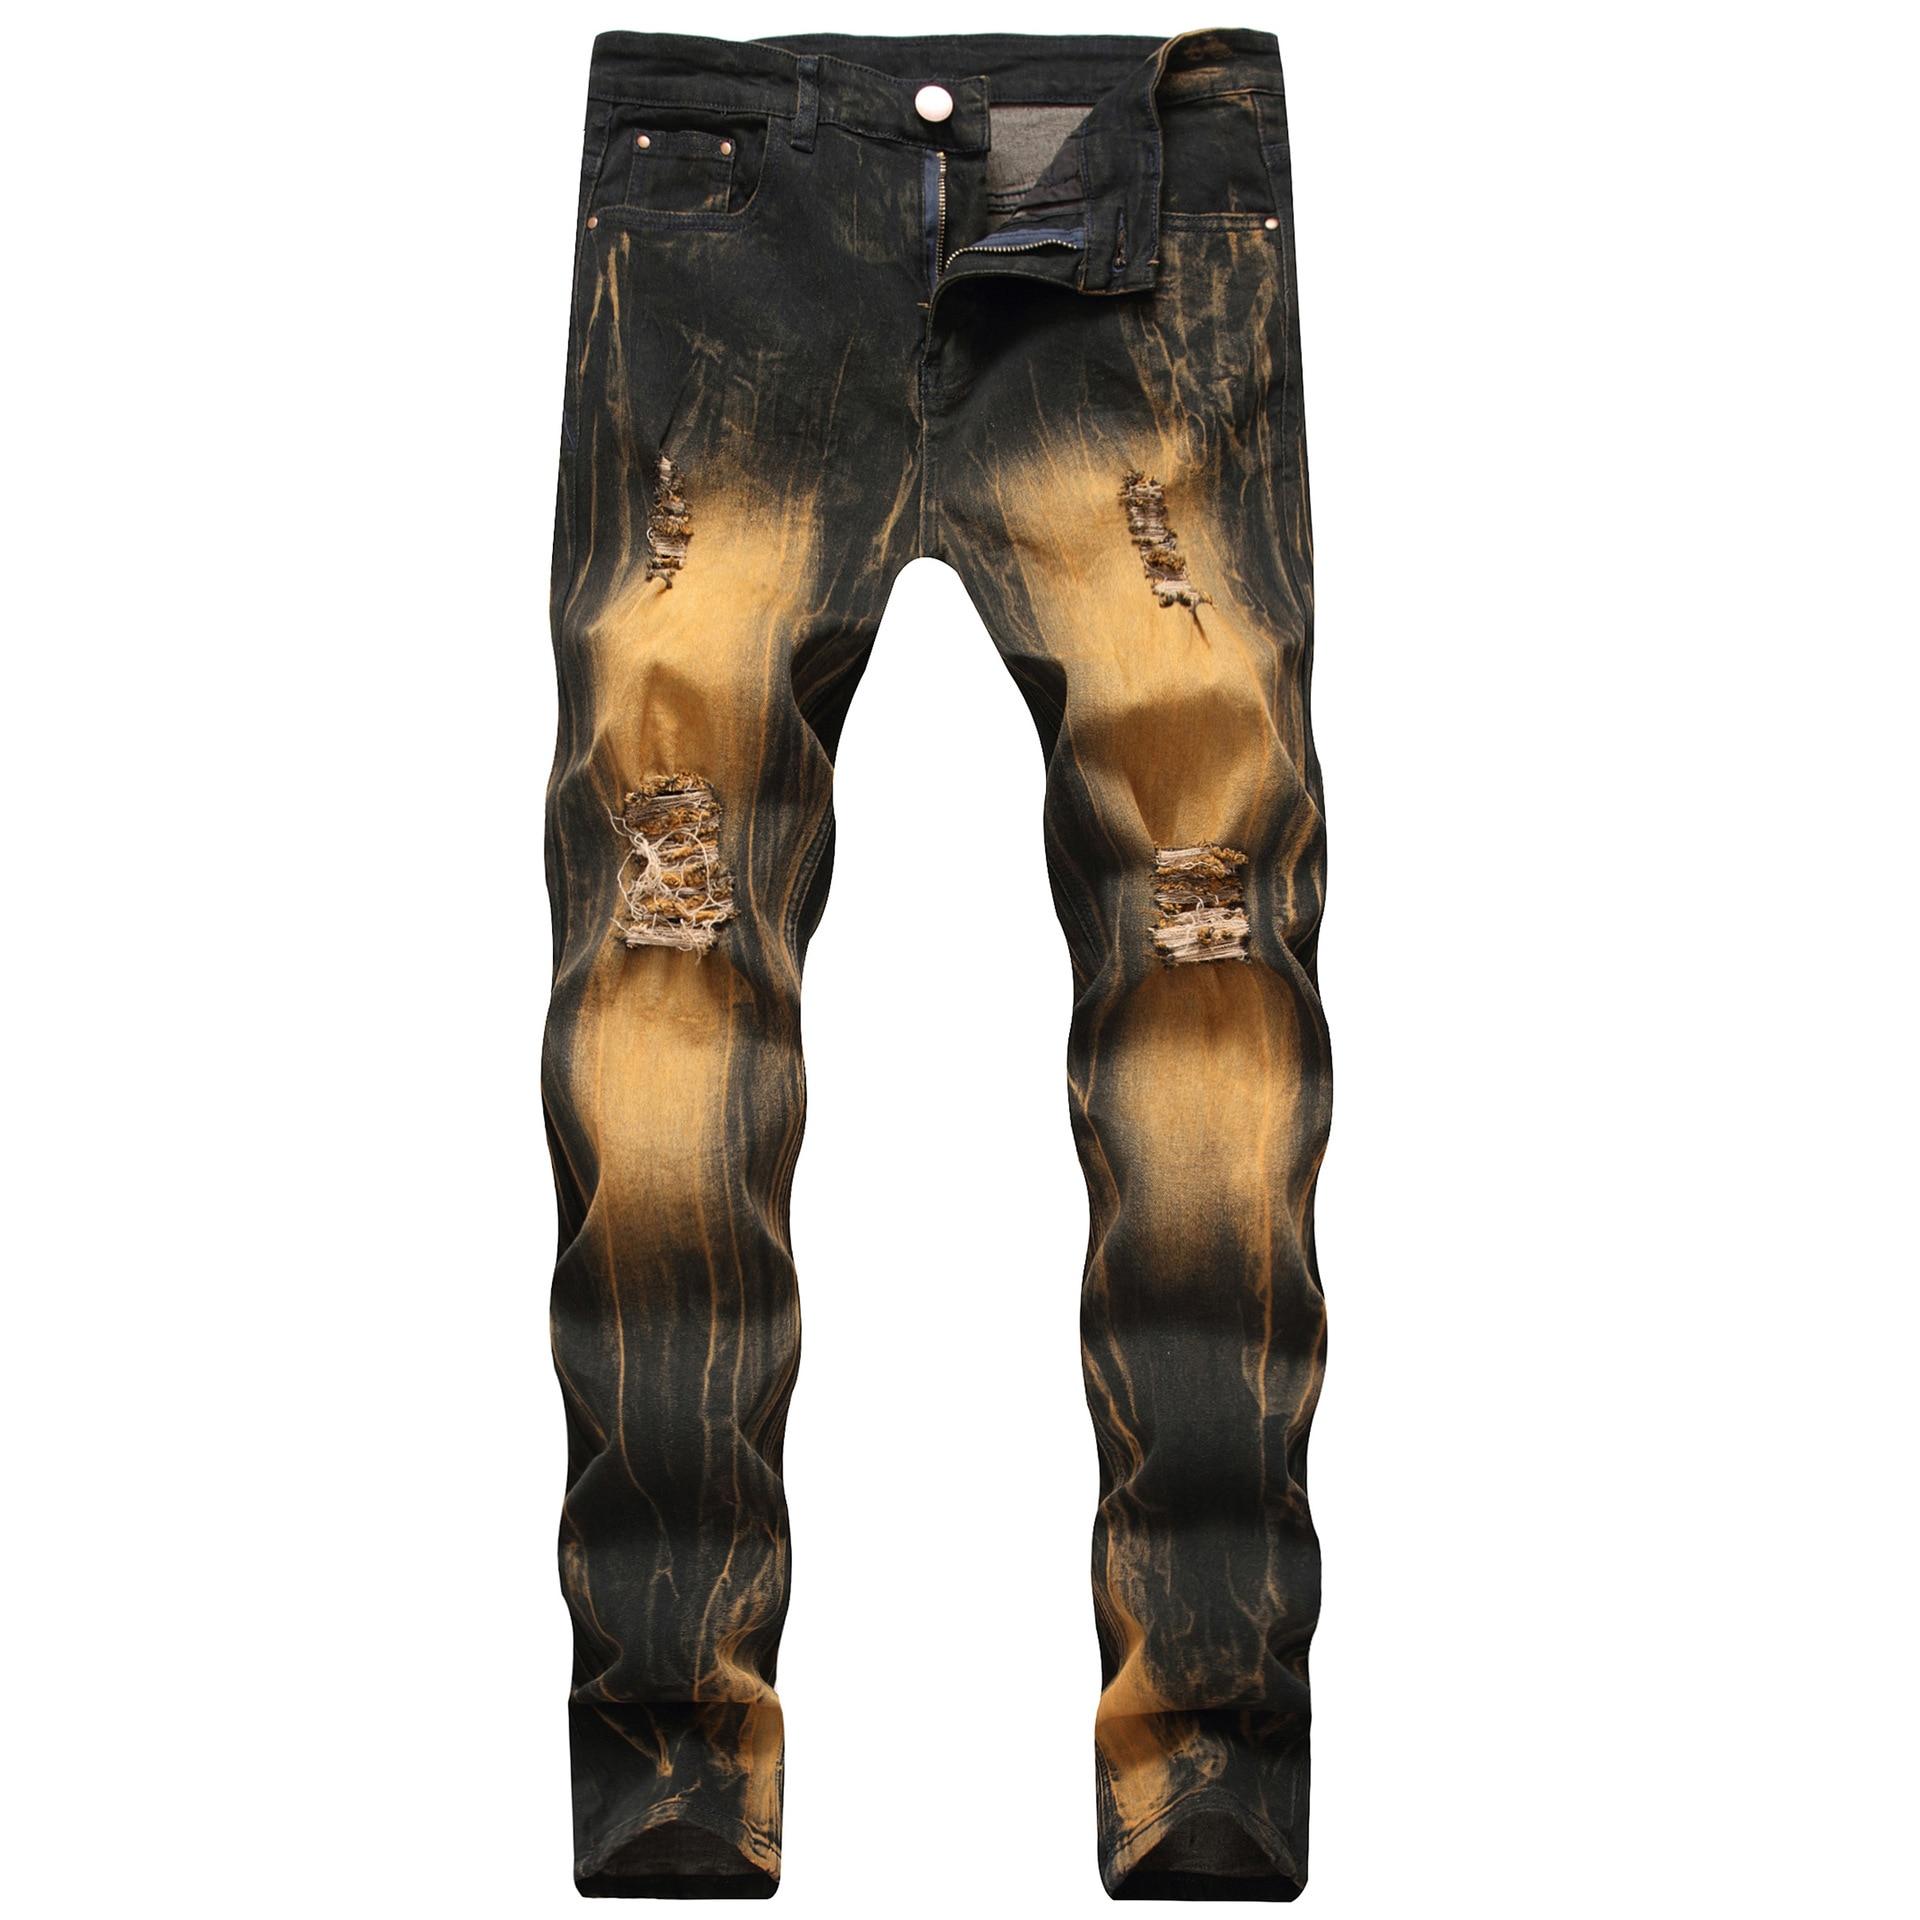 2019 Fashion Vintage Ripped Jeans For Men Washed Slim Retro Distressed Denim Pants Full Length Plus Size Hip Hop Jeans Men Brand